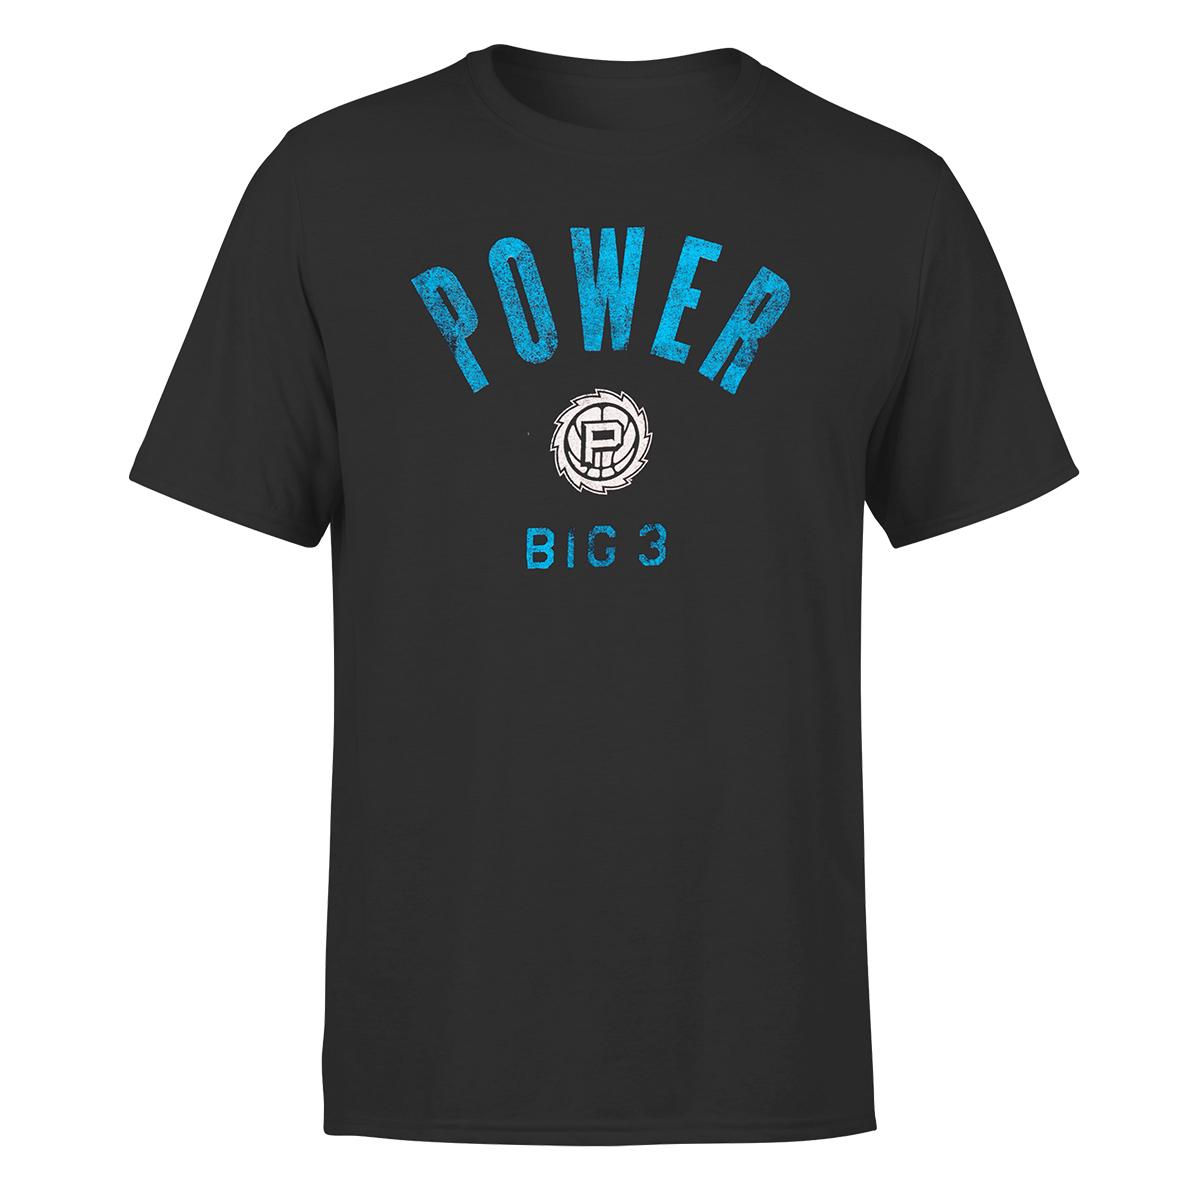 Power Black T-shirt